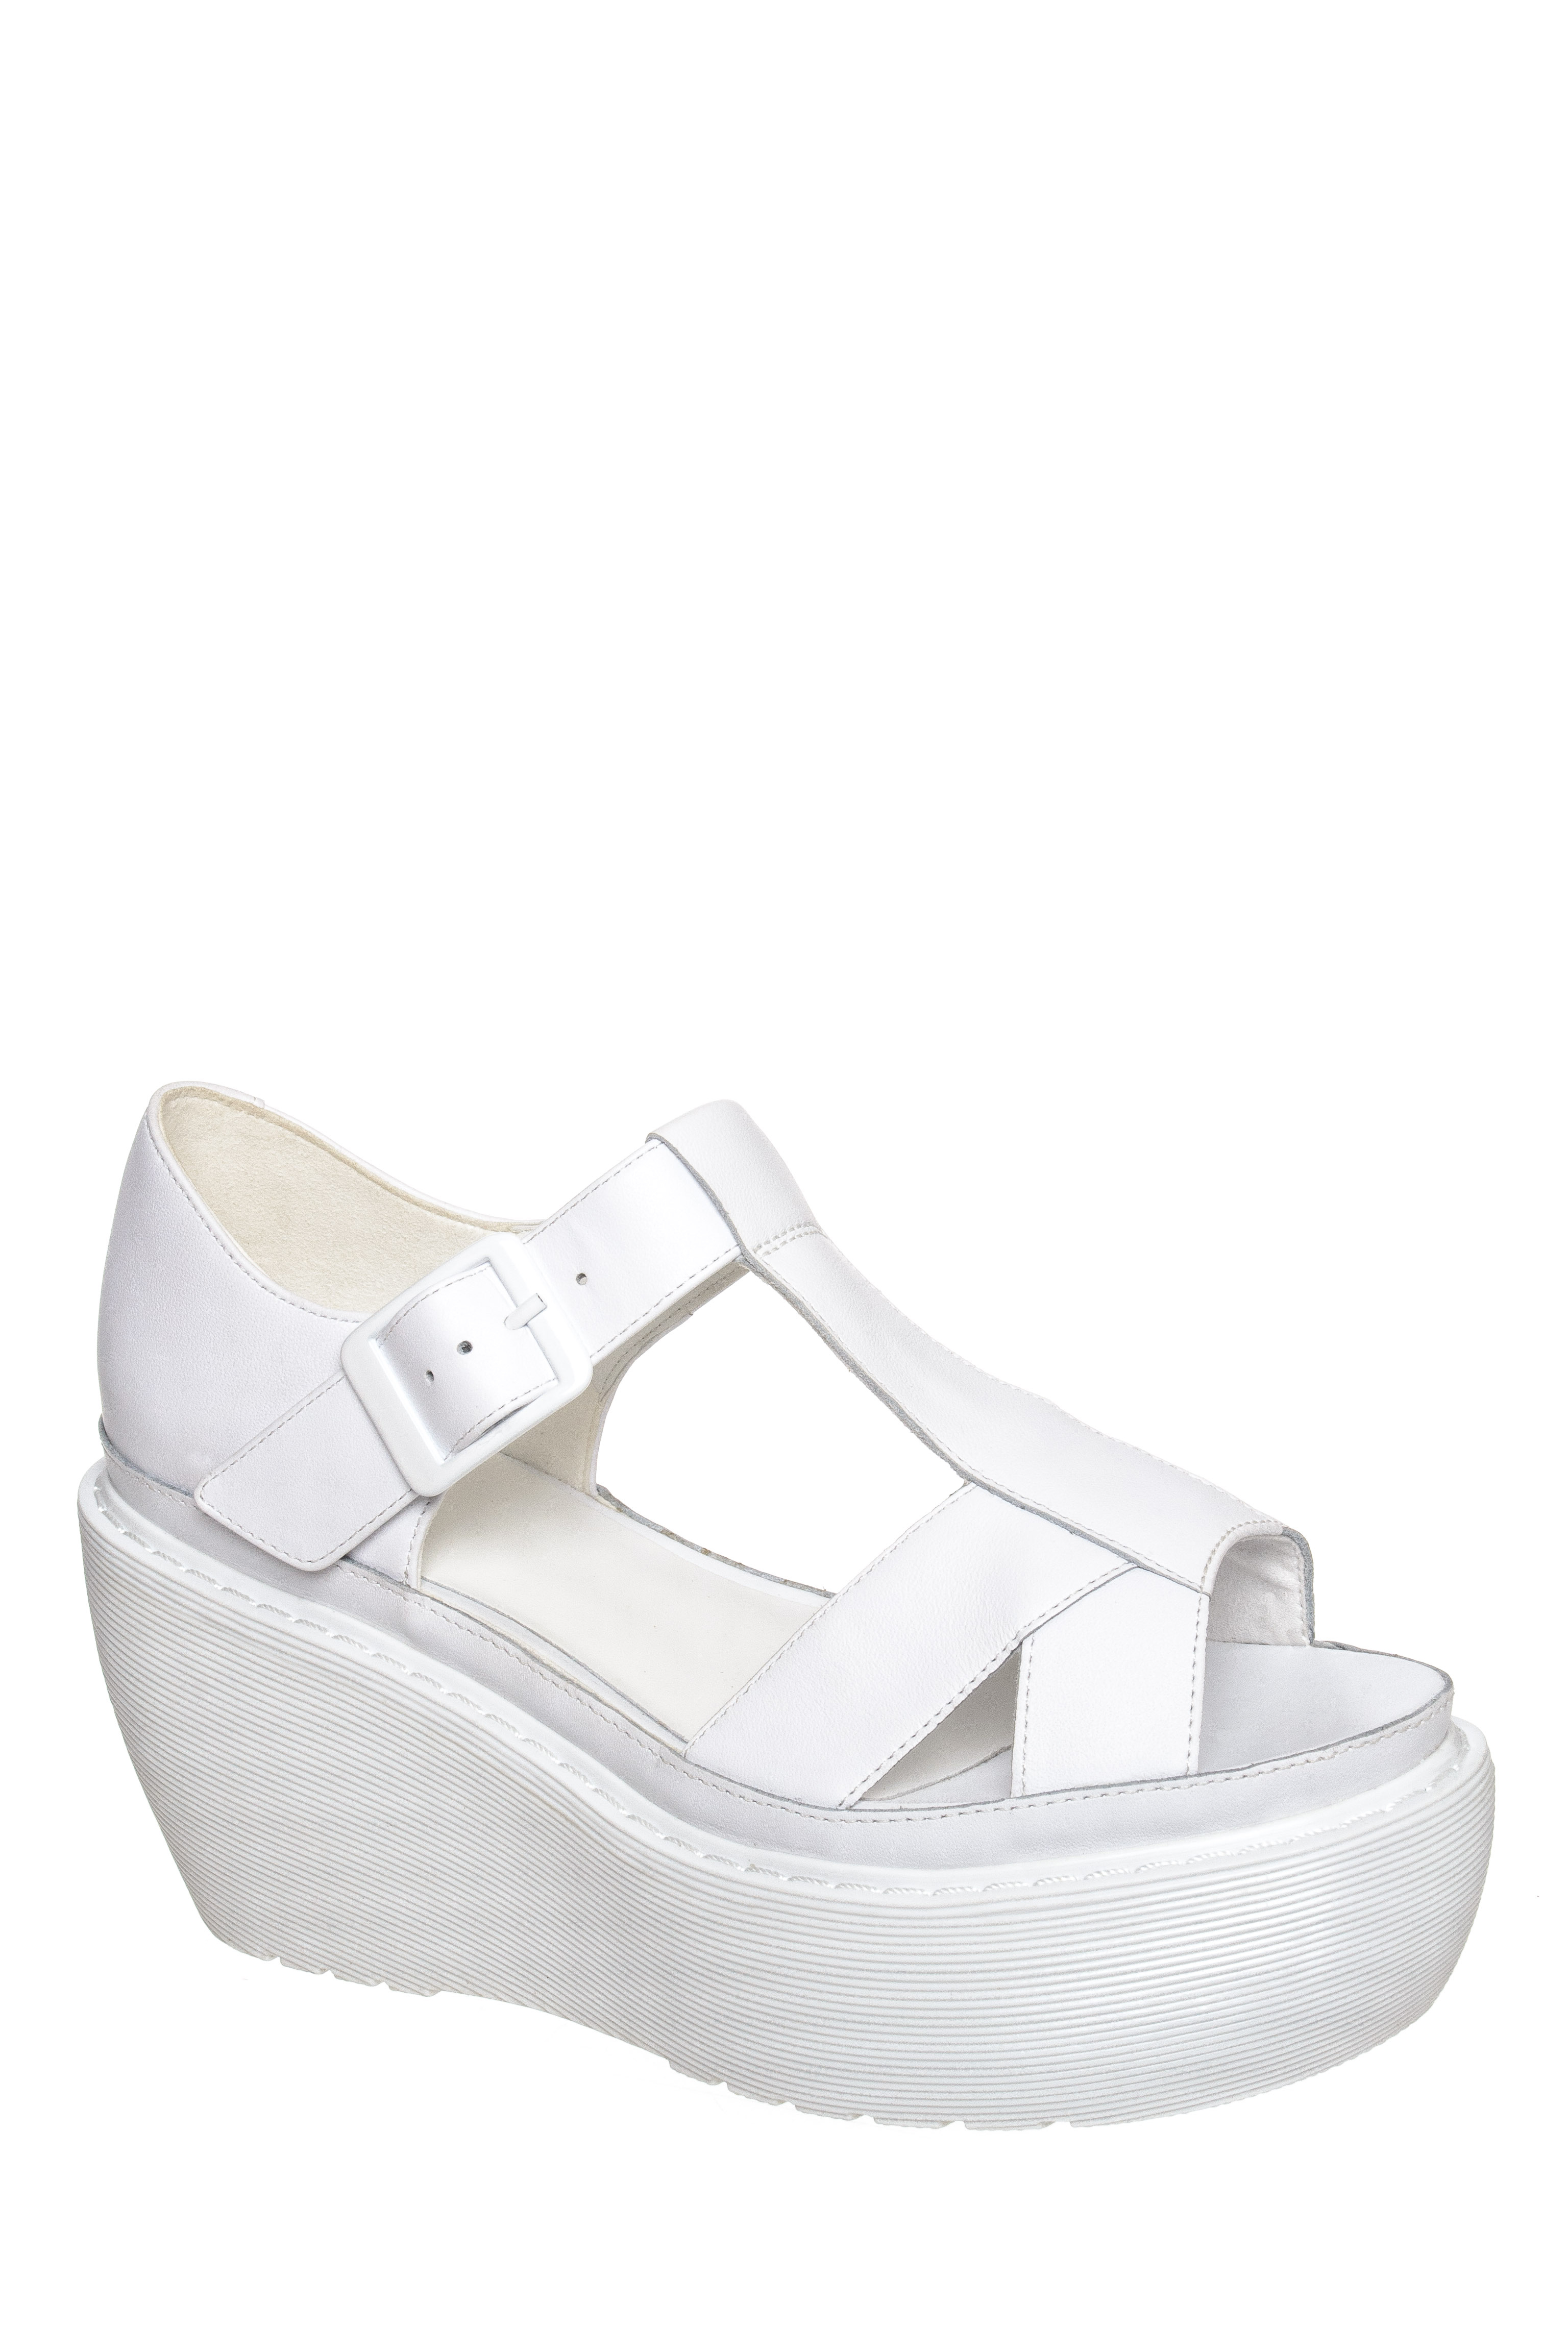 Adaya Platform Wedge Sandal